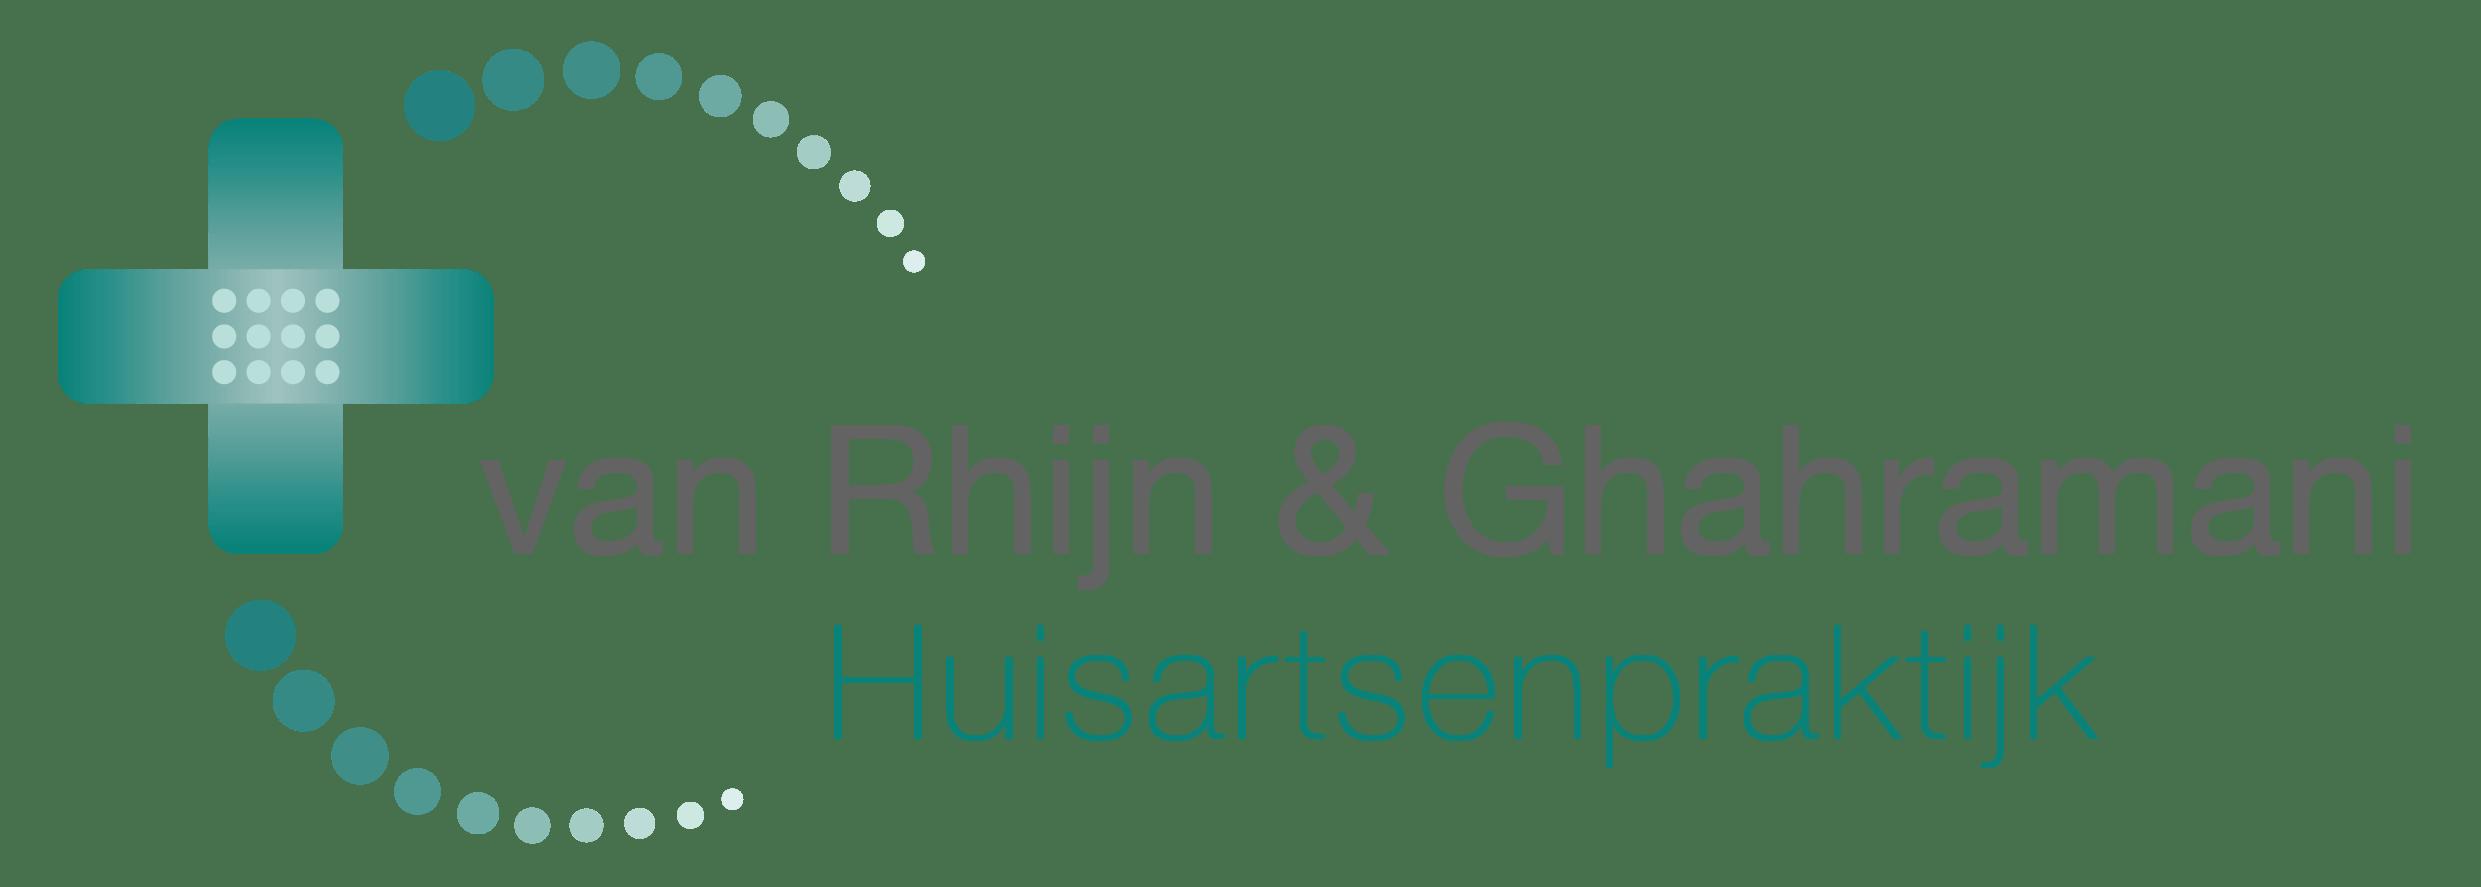 Huisartsenpraktijk van Rhijn & Ghahramani